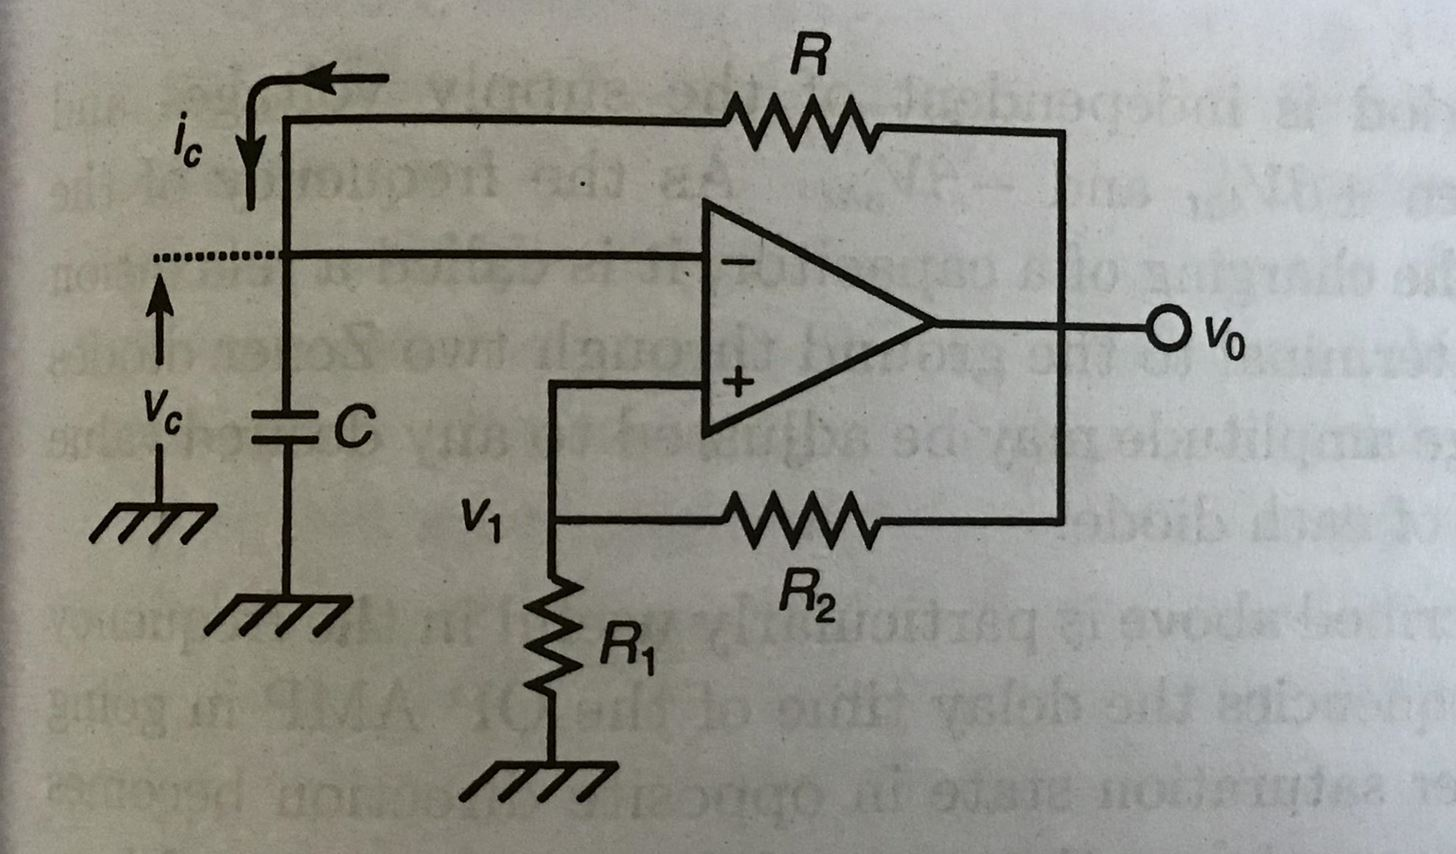 How to - Make Flashing LED Using Op-Amp